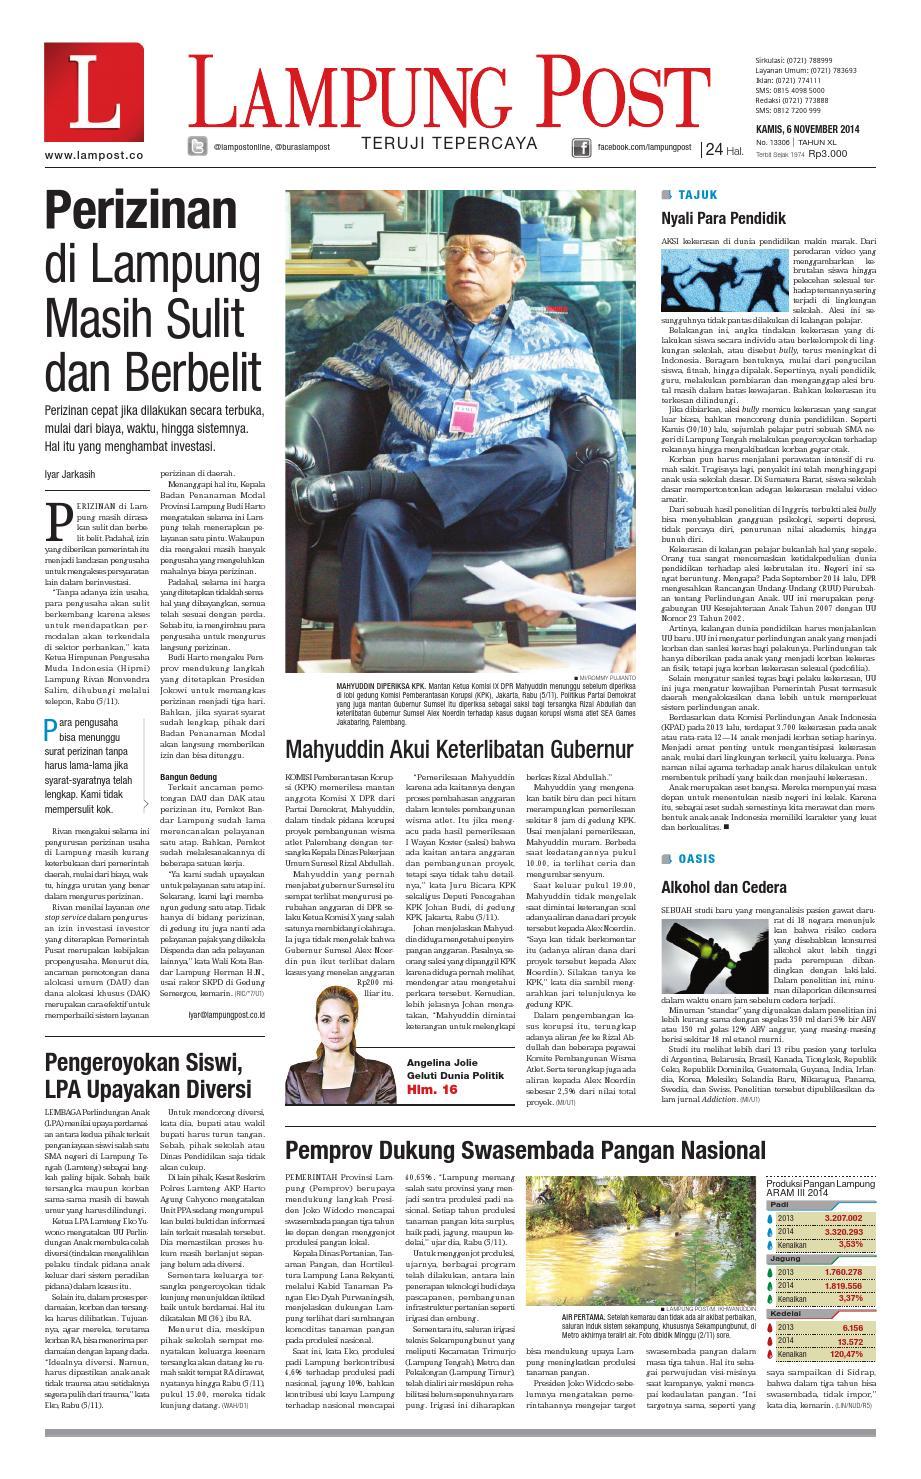 Lampung Post Kamis 6 November 2014 By Issuu Produk Ukm Bumn Sulam Usus Pmk